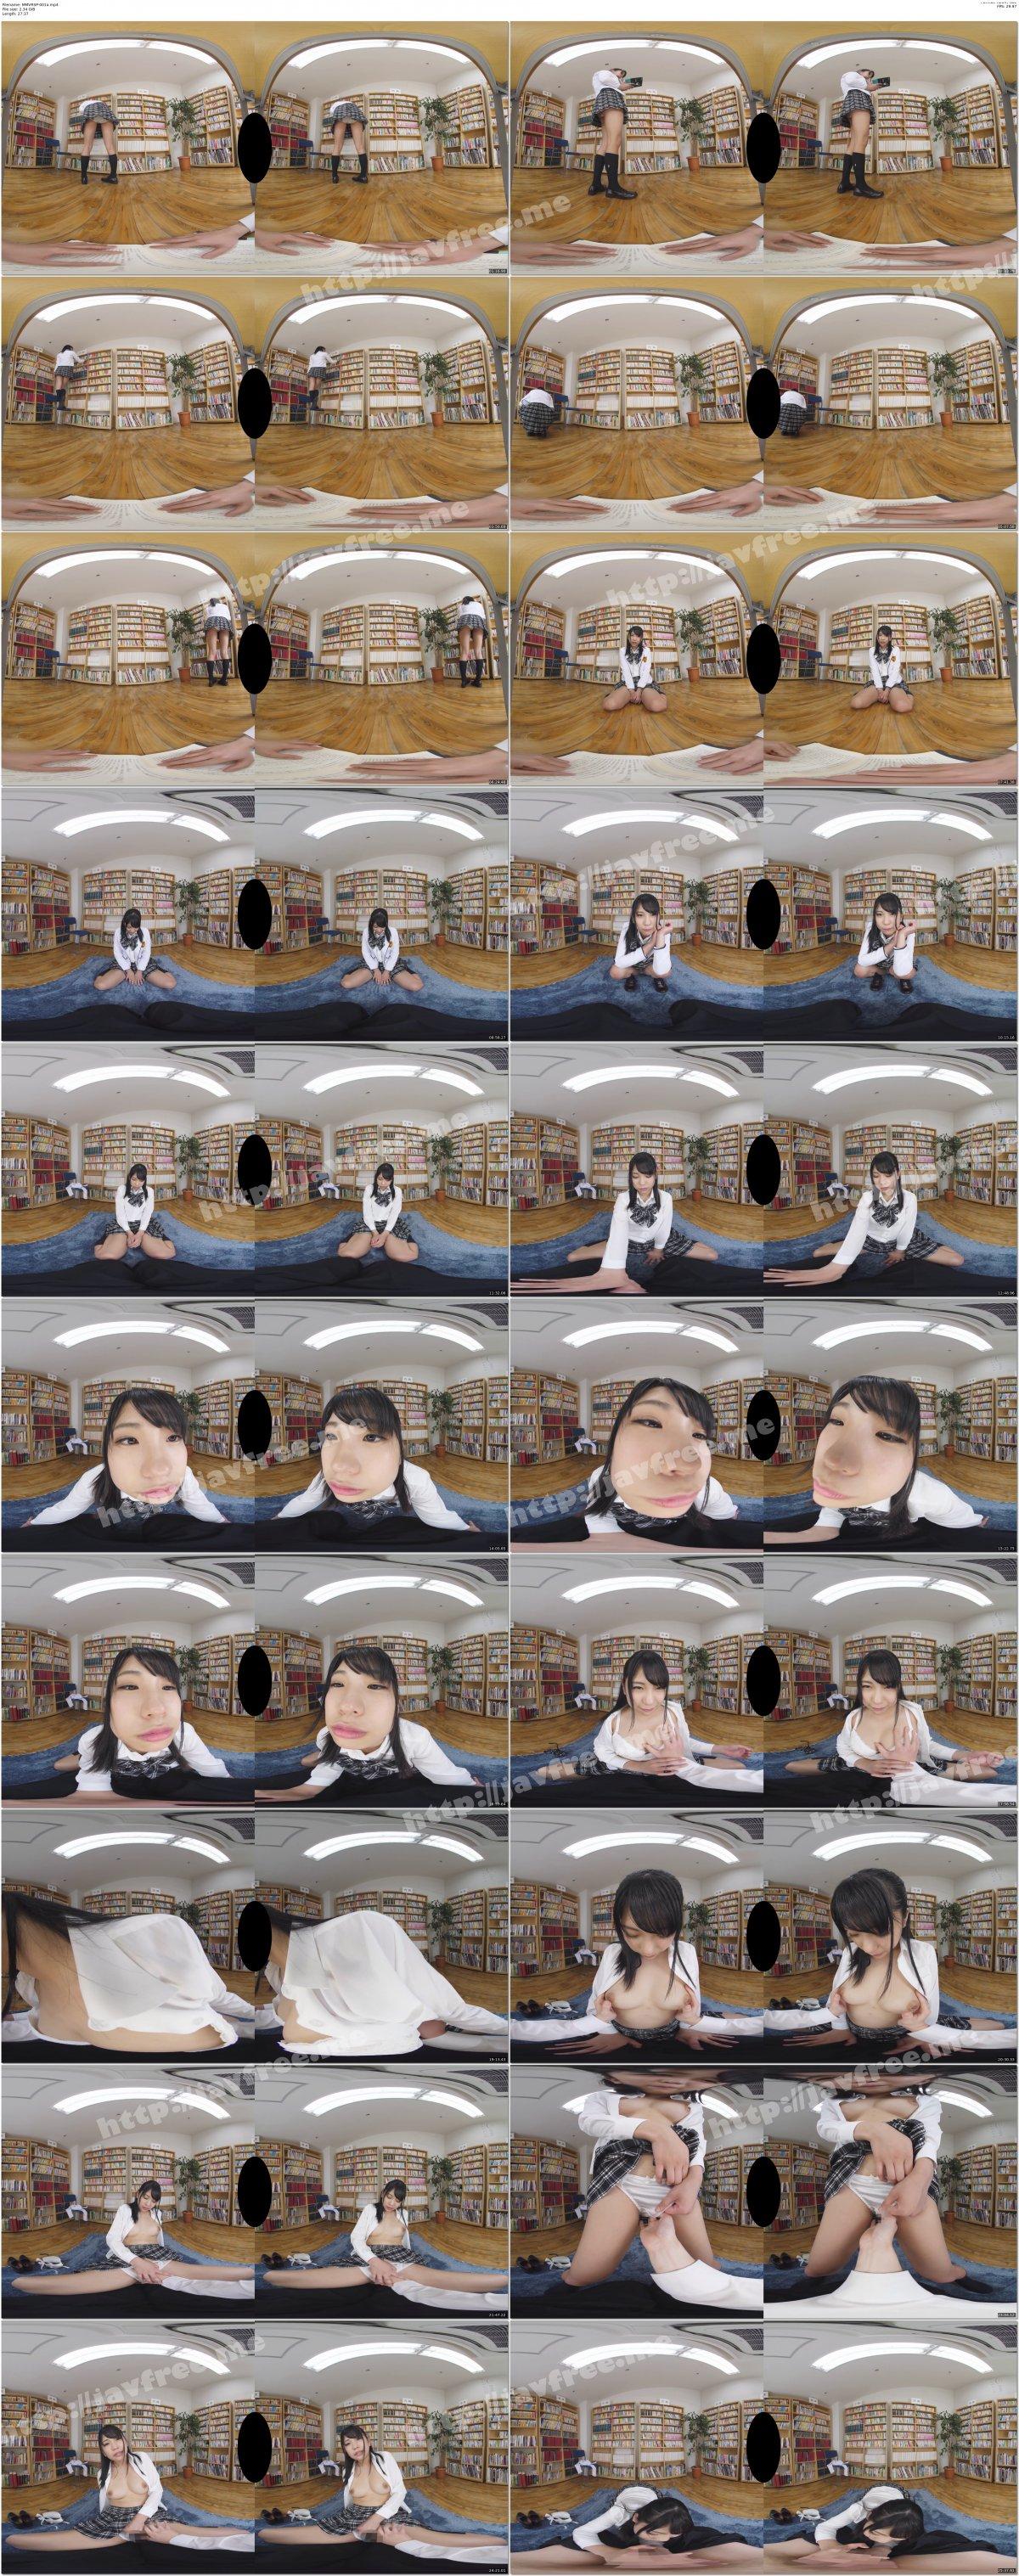 [MMVRSP-001] 【VR】学園1の超美脚黒髪美少女高杉麻里ちゃんと図書室でこっそりパンチラ視姦&ラブラブ2回連続中出しSEX